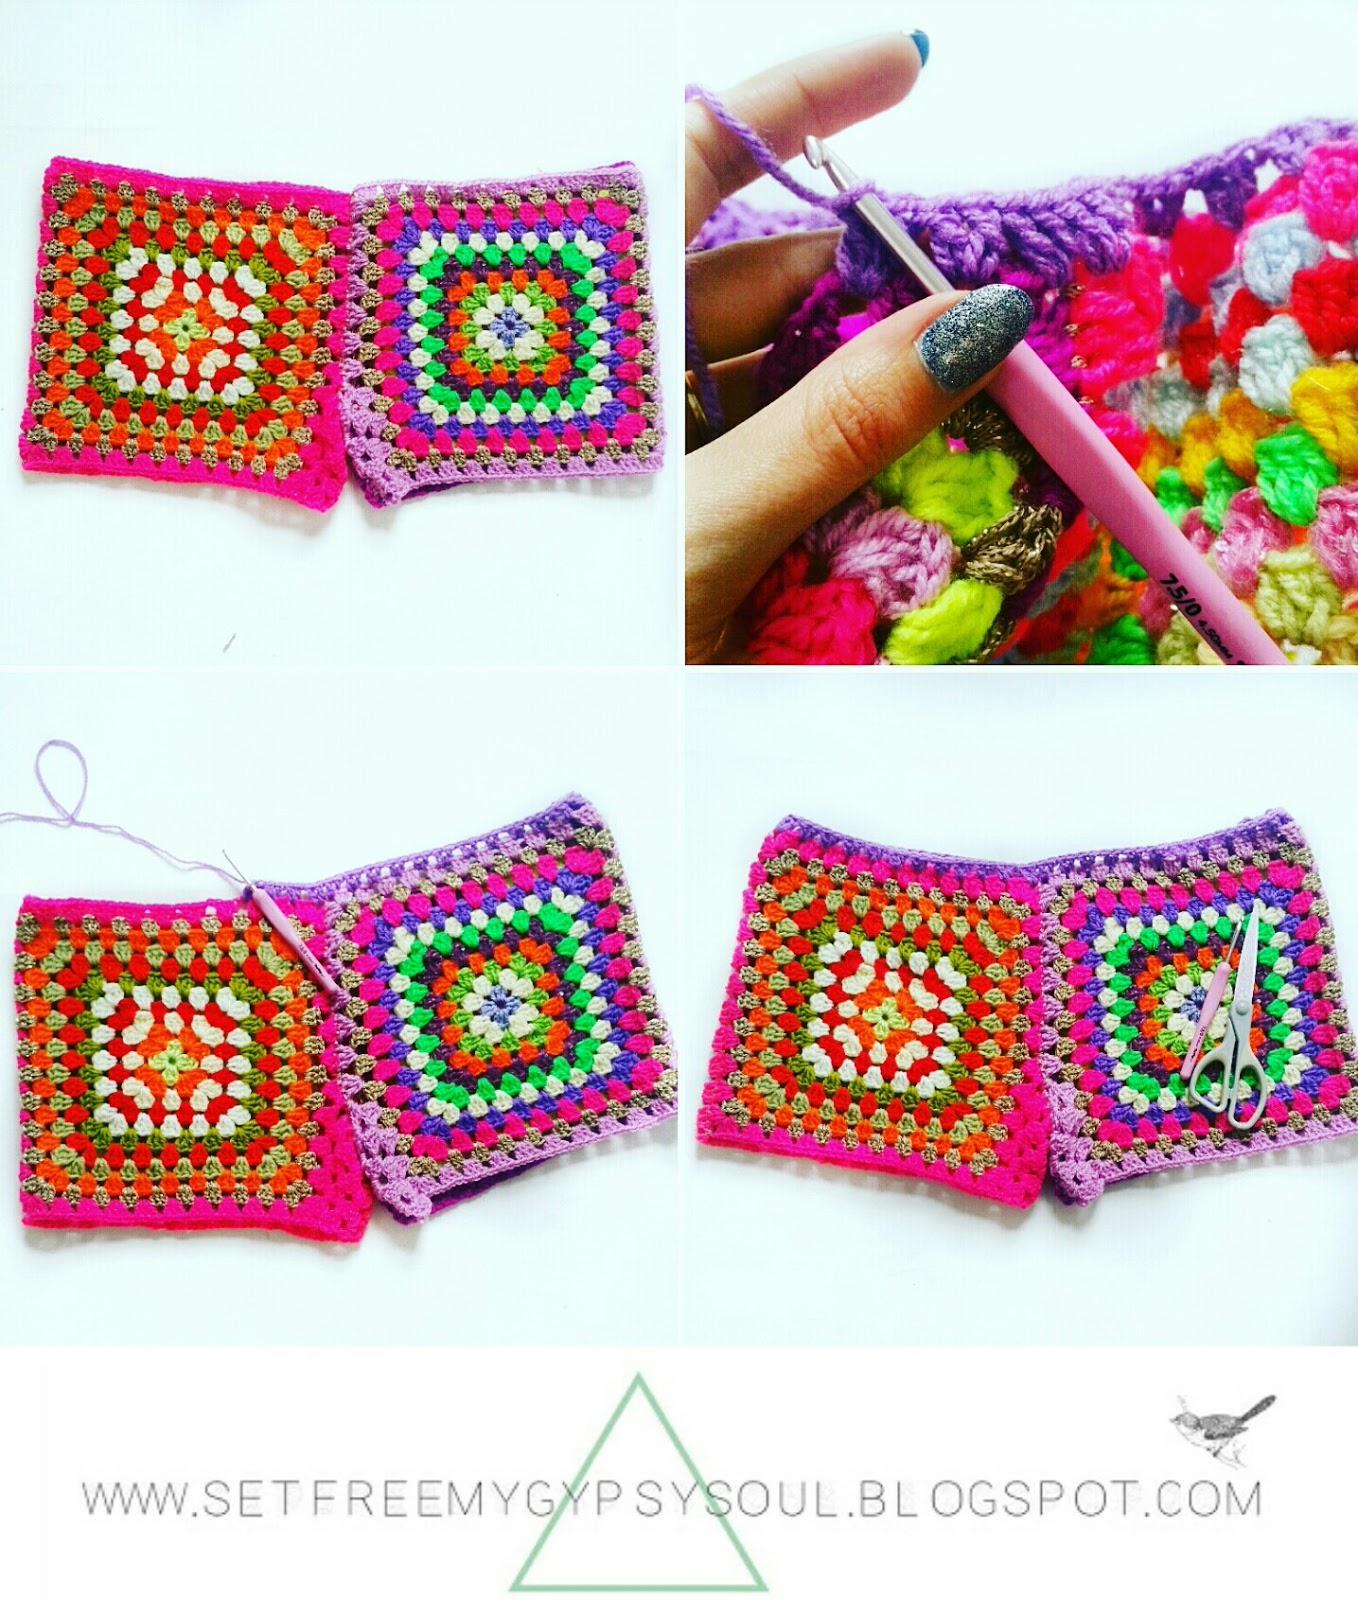 Set Free My Gypsy Soul | a Crochet Craft blog : Granny Square ...